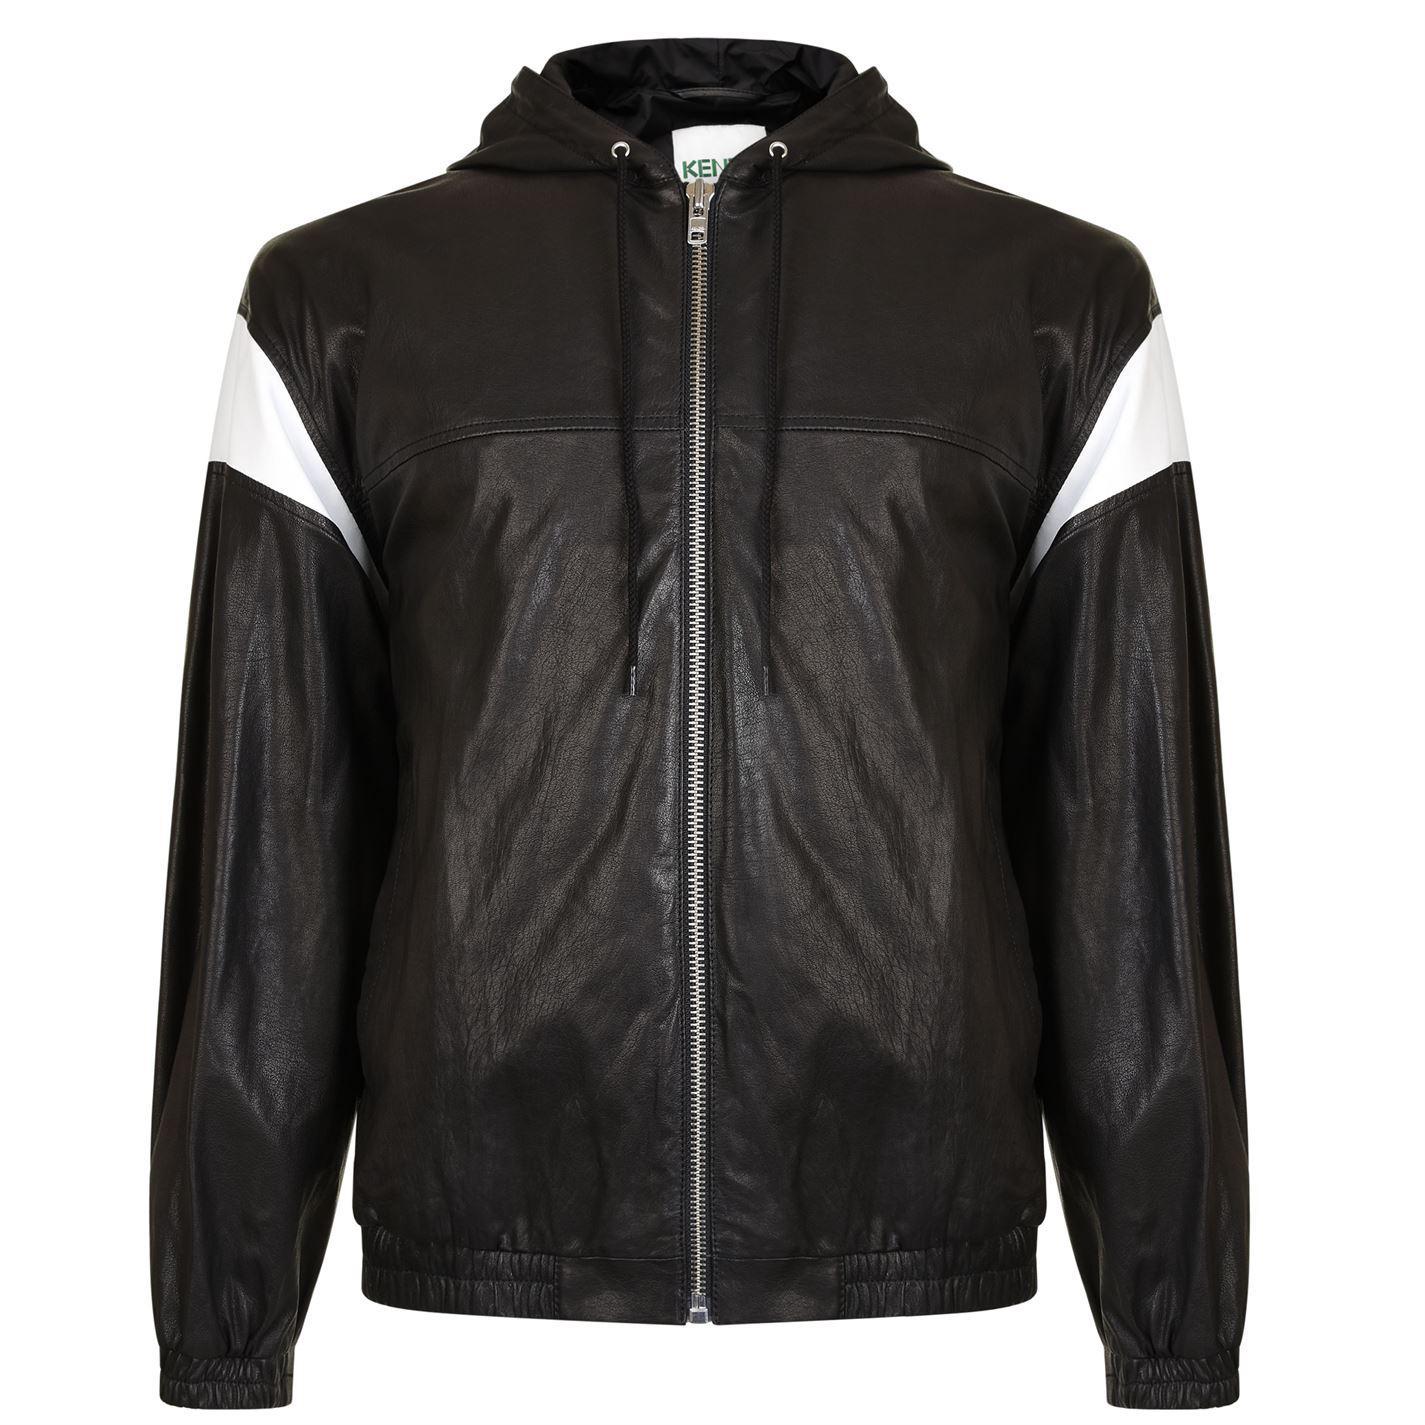 cc49dc35 KENZO 'hyper ' Leather Jacket in Black for Men - Lyst